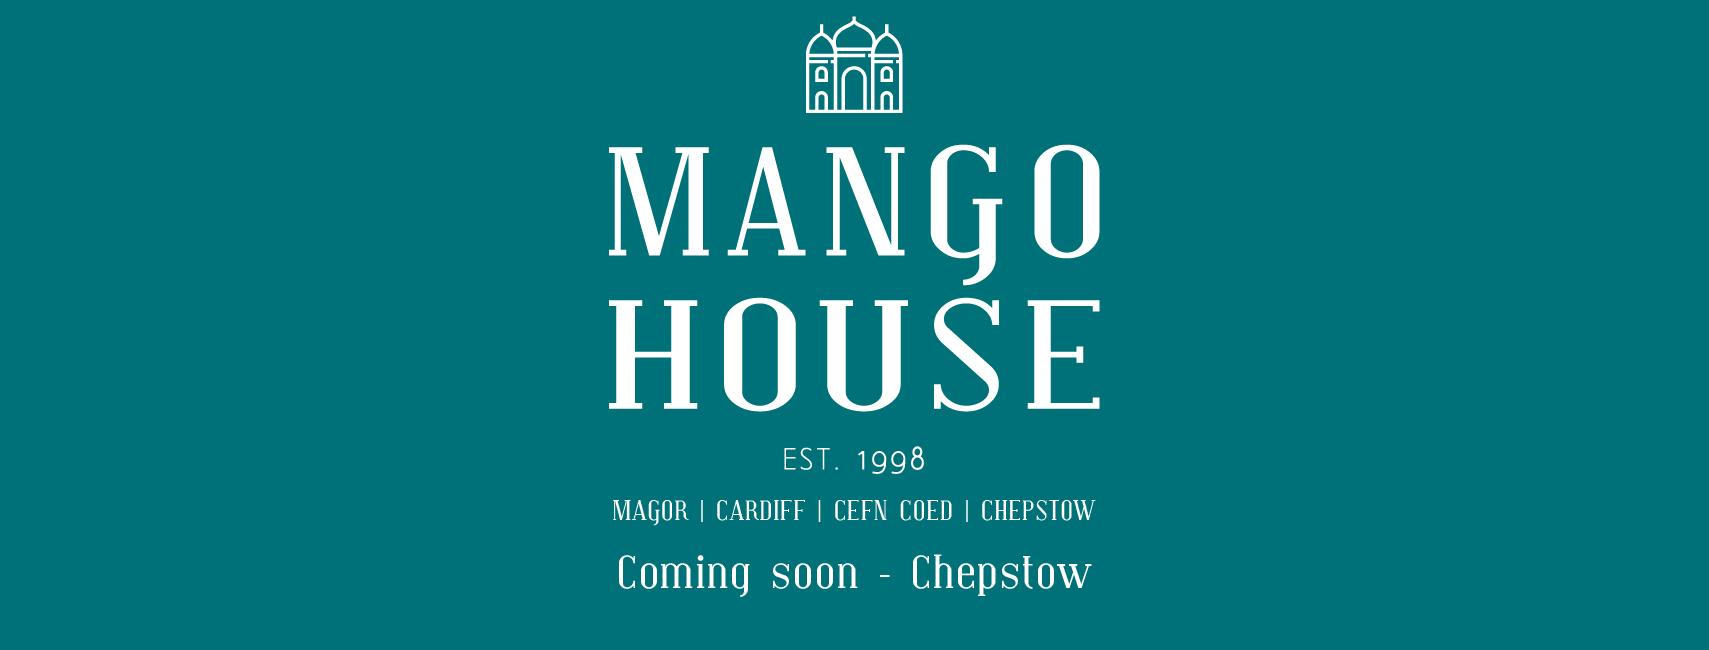 manghouse-fb-coverimage-profileimage-01